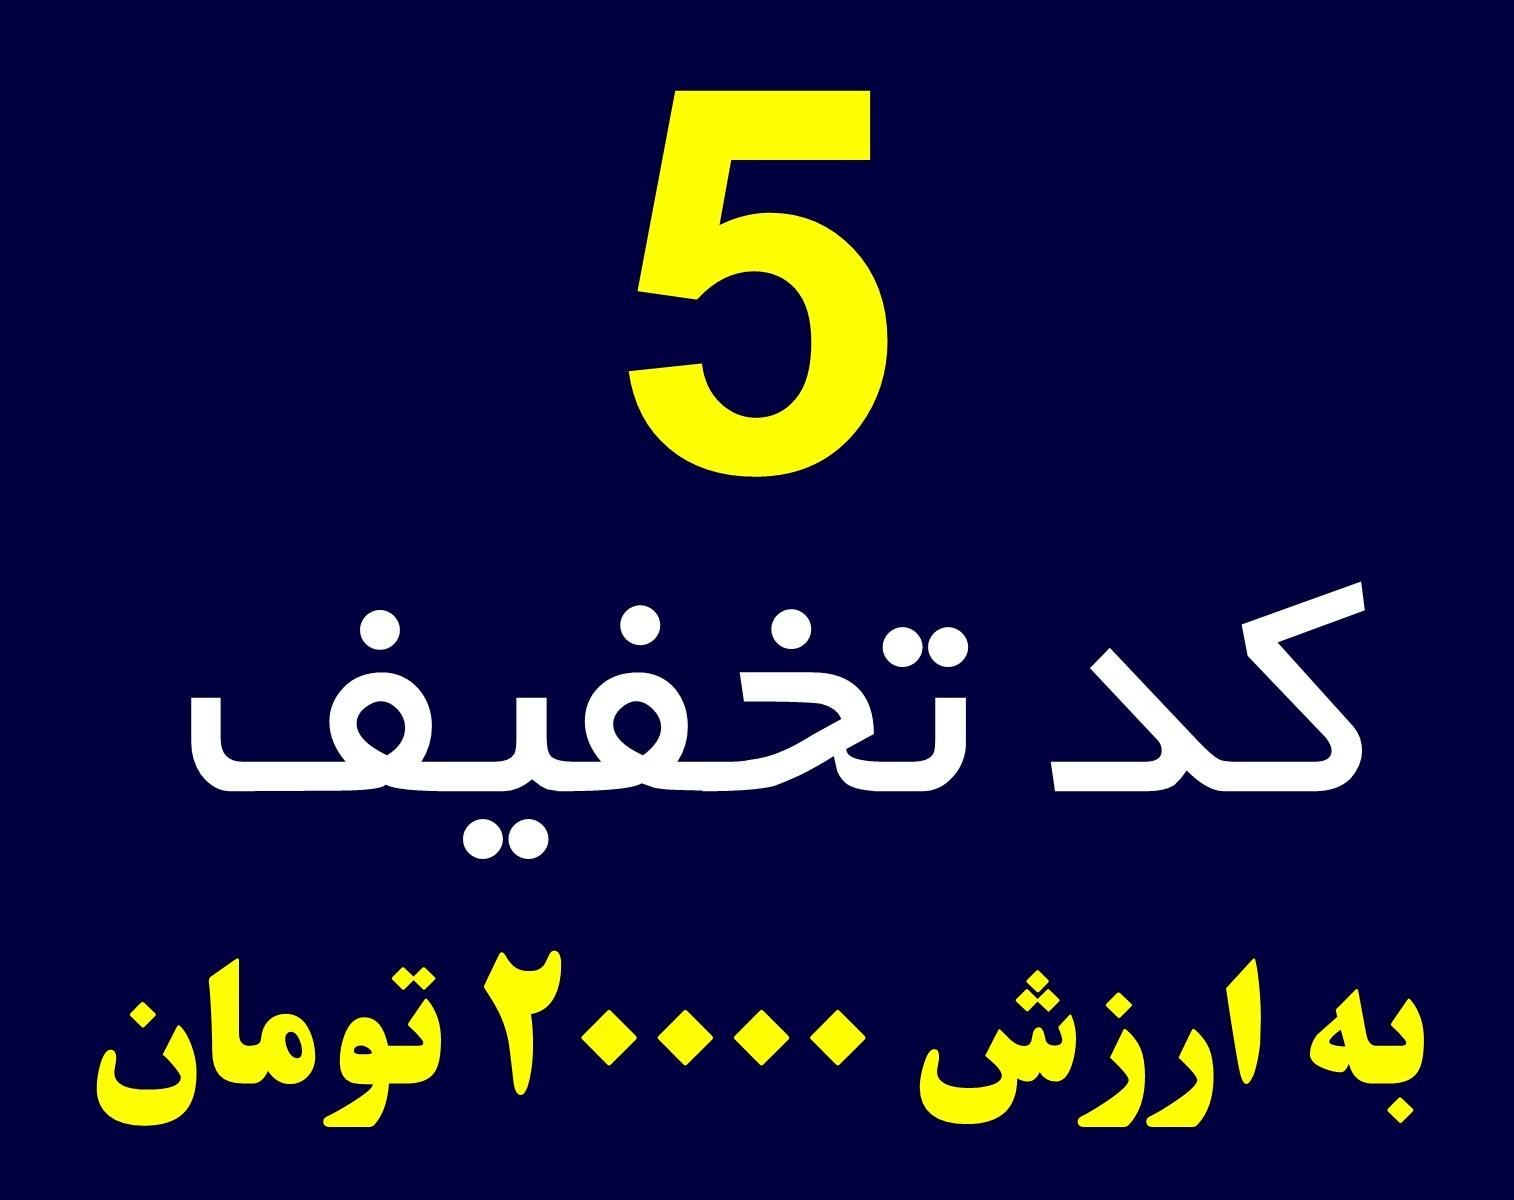 bg header - کد های تخفیف امروز ارور موبایل